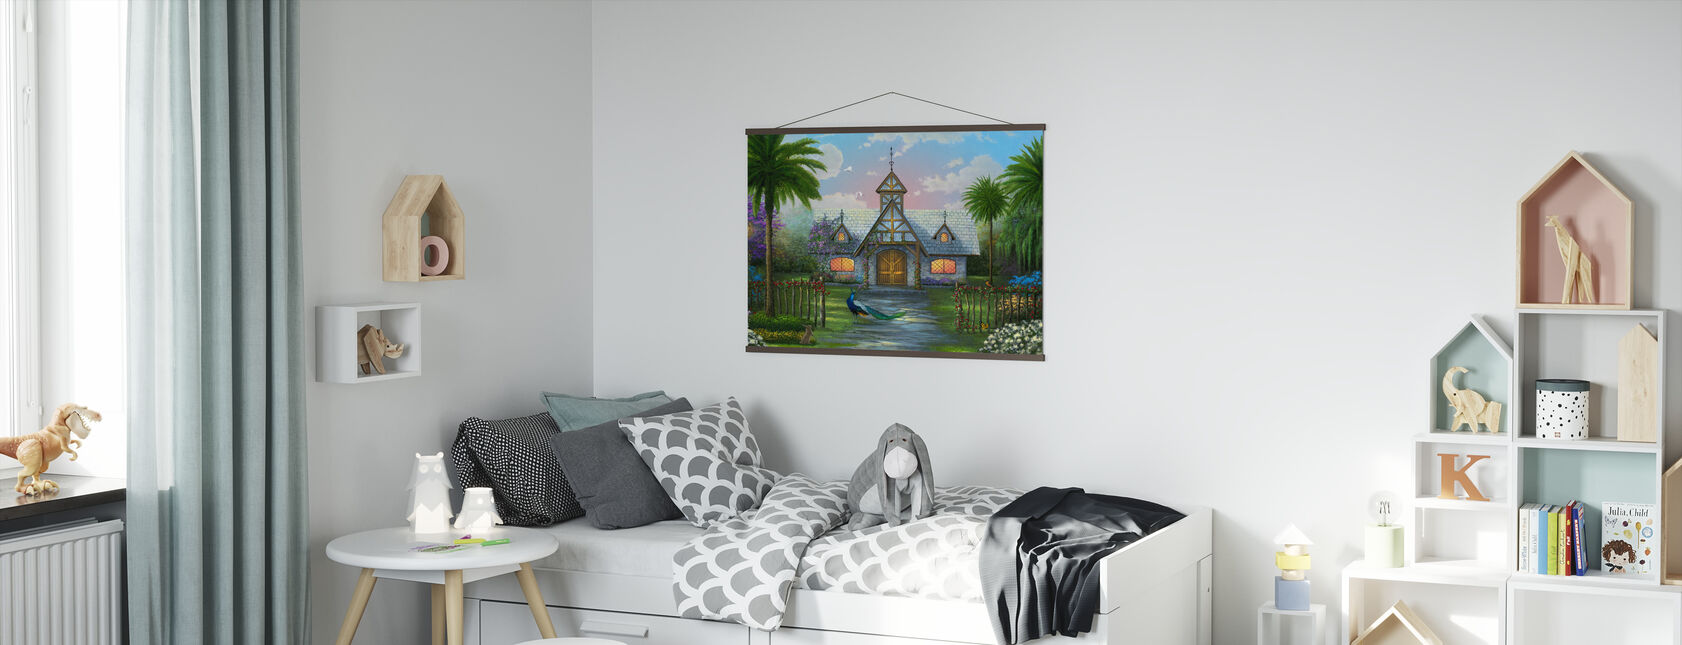 Paradise Cottage - Poster - Kids Room